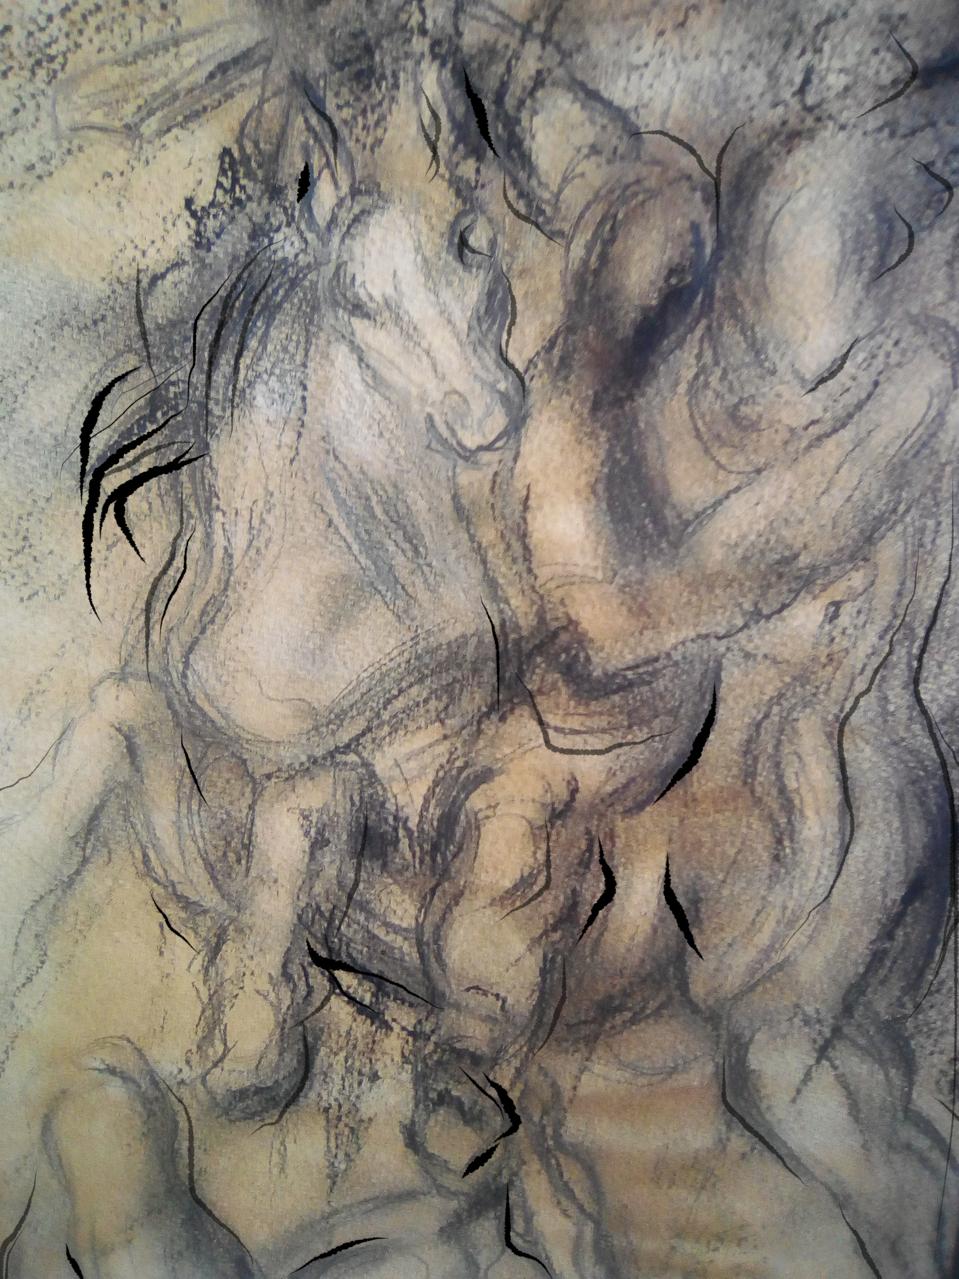 Tiziano Vecellio / Titolo: Dominus Venustas Illust of Grandicelli Susanna MasterpieceFanart pittura art fan